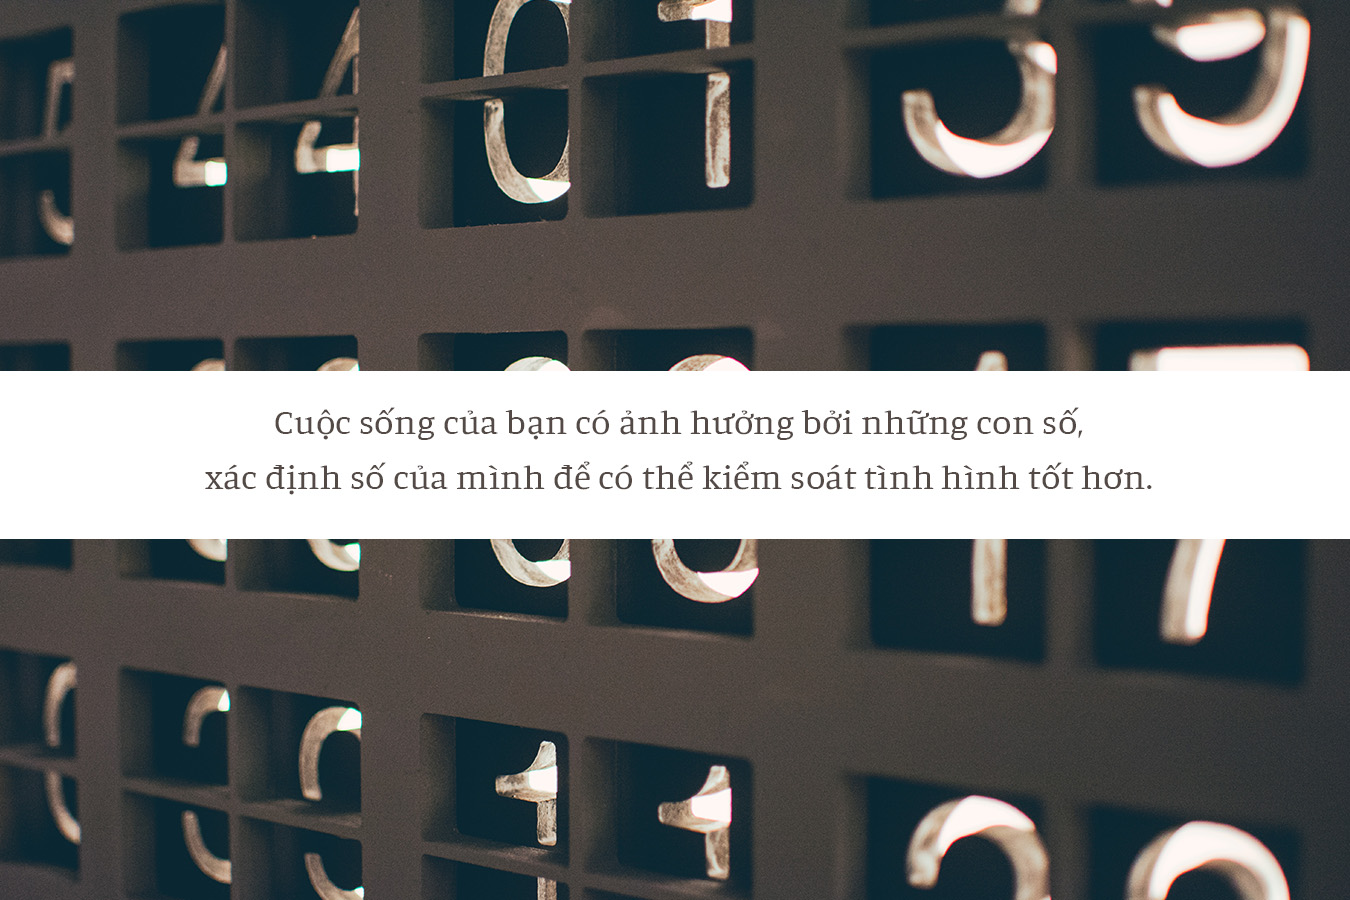 Ảnh: unsplash.com Edit: Nguyễn Hiếy